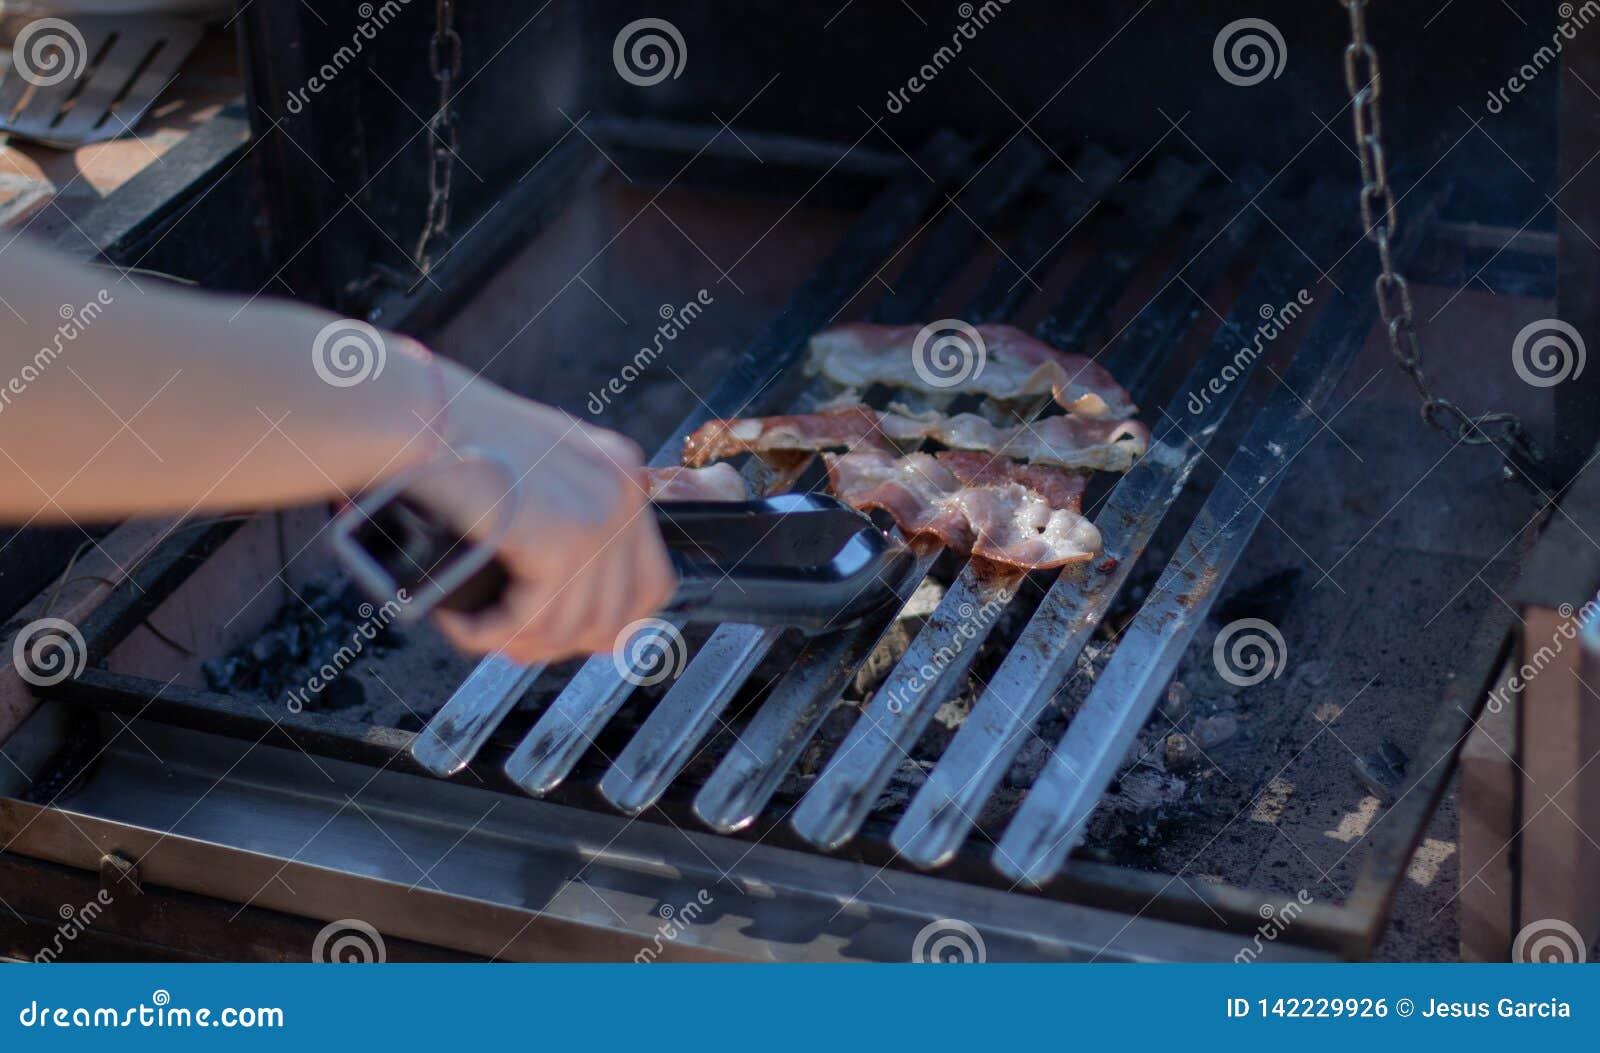 Бекон варя на барбекю угля с руками держа пару схватов